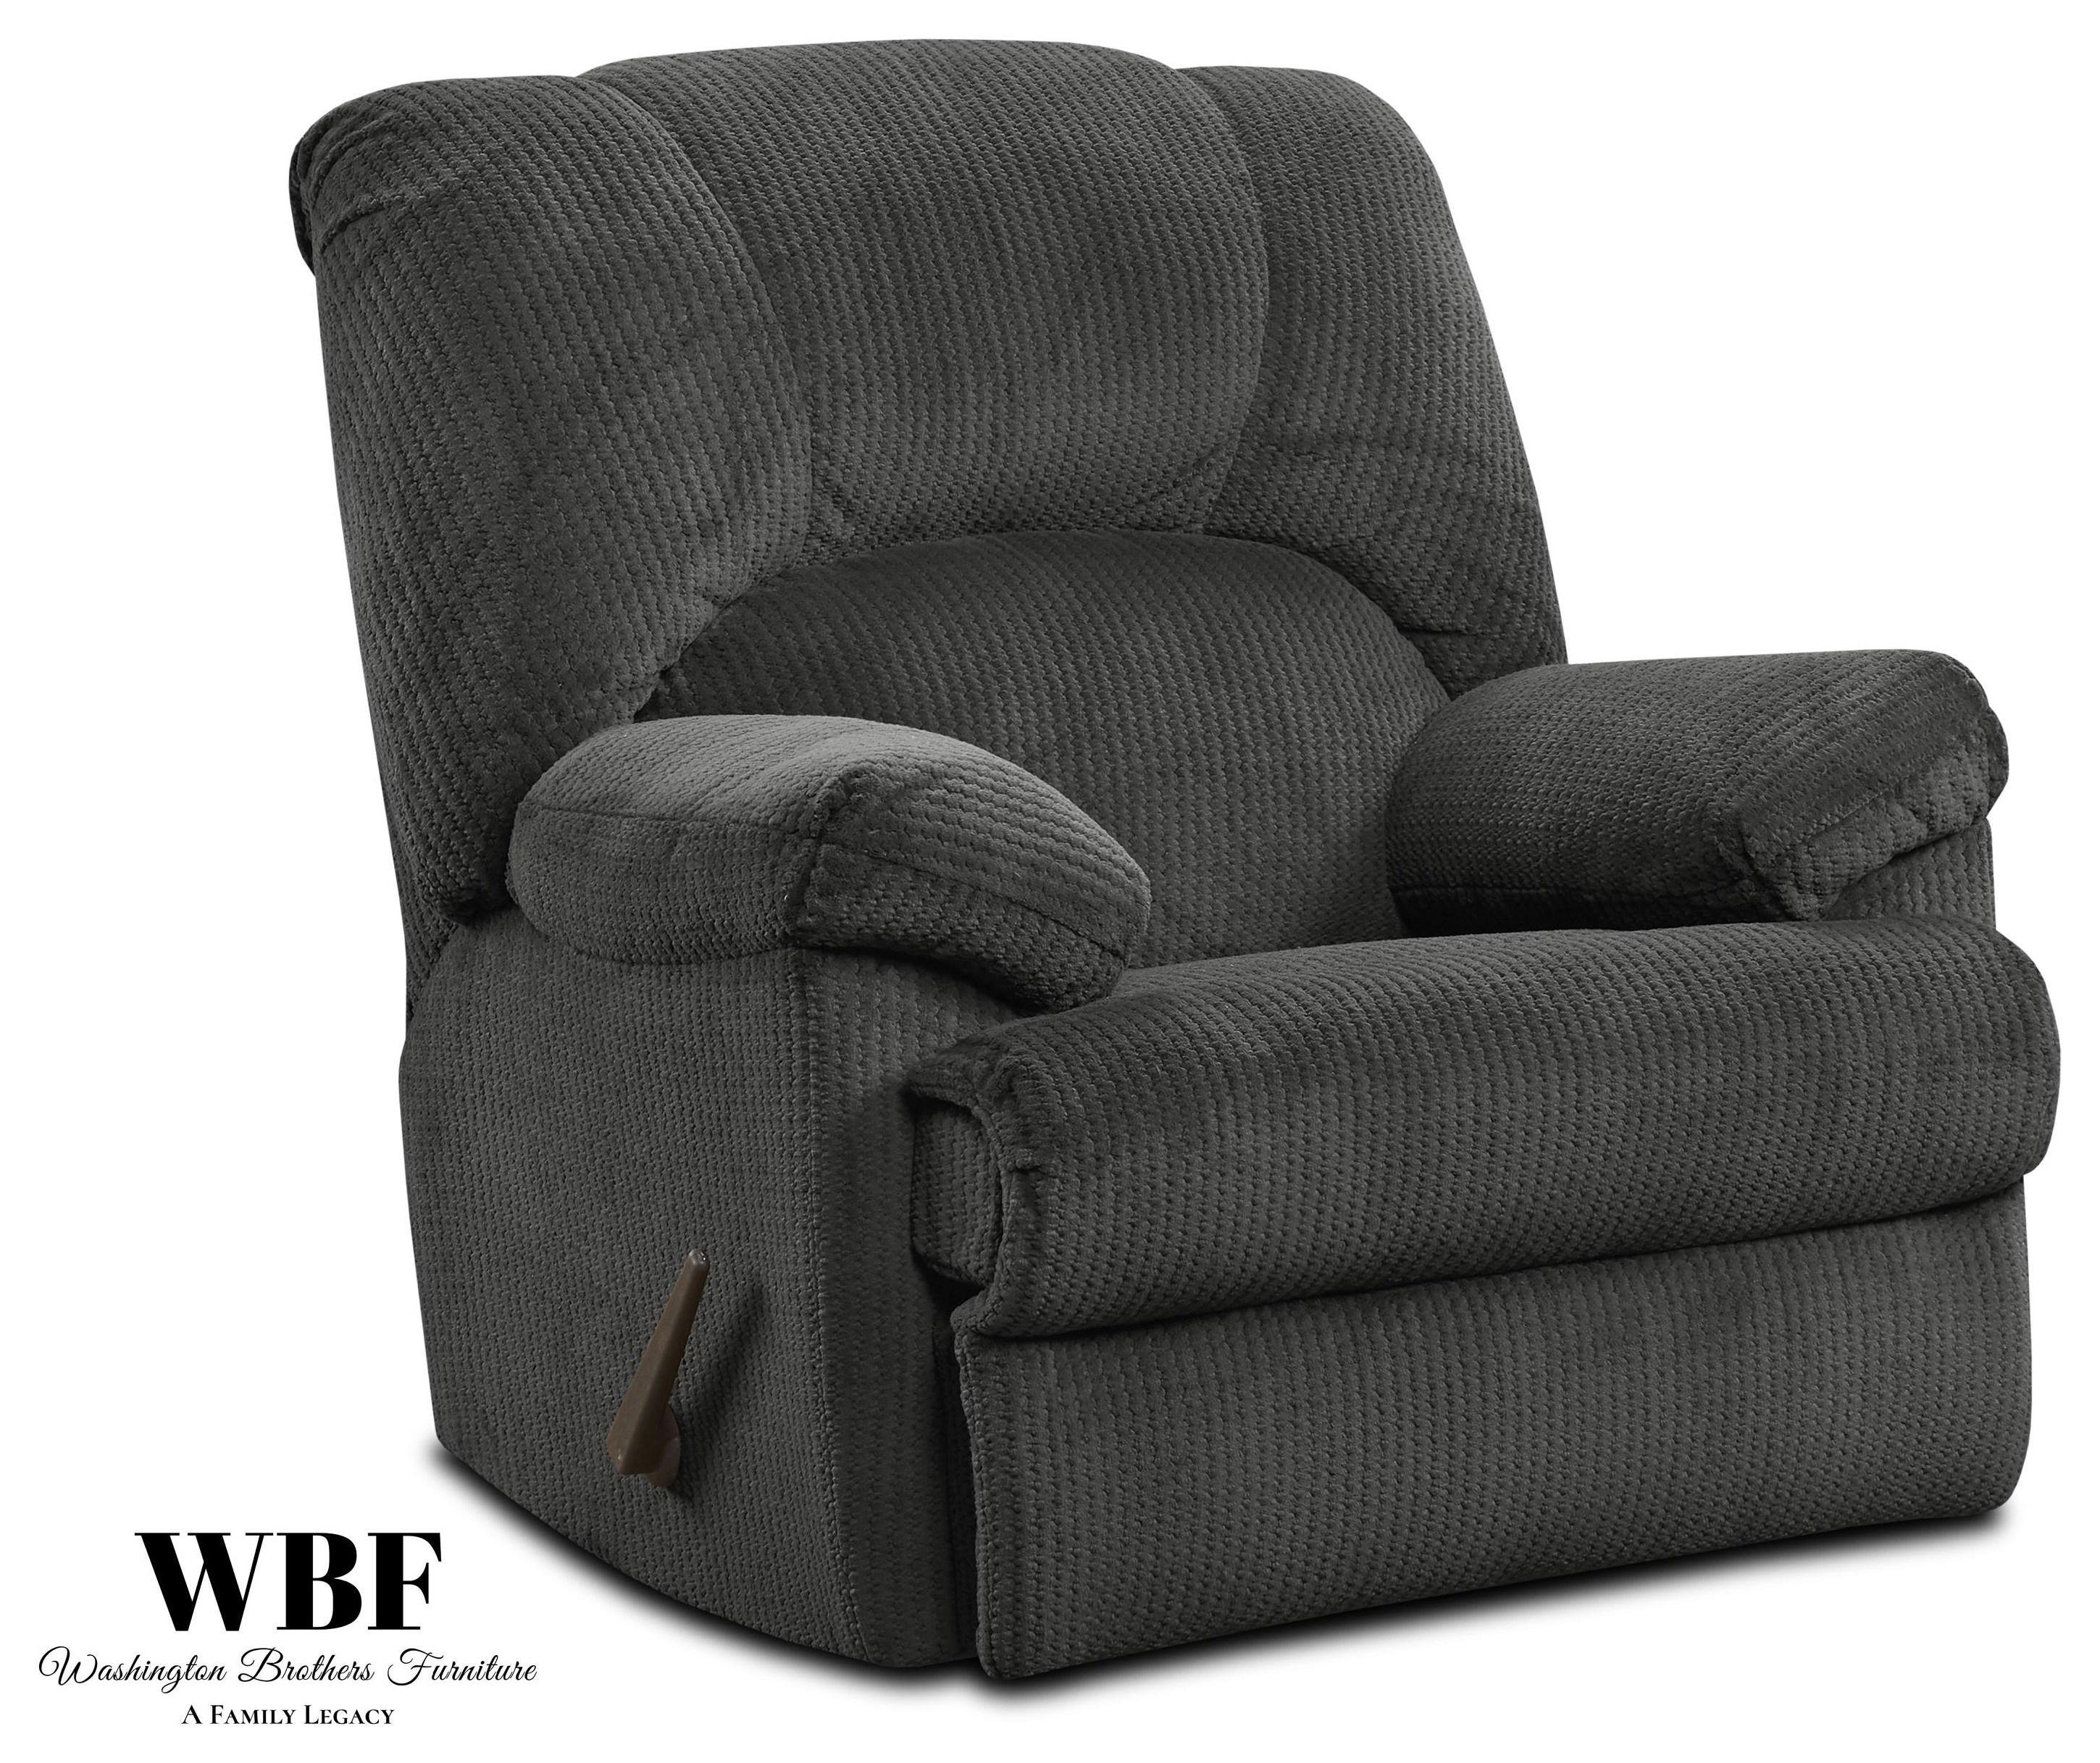 9015 Rocker Recliner - Slate by Washington Brothers Furniture at Furniture Fair - North Carolina